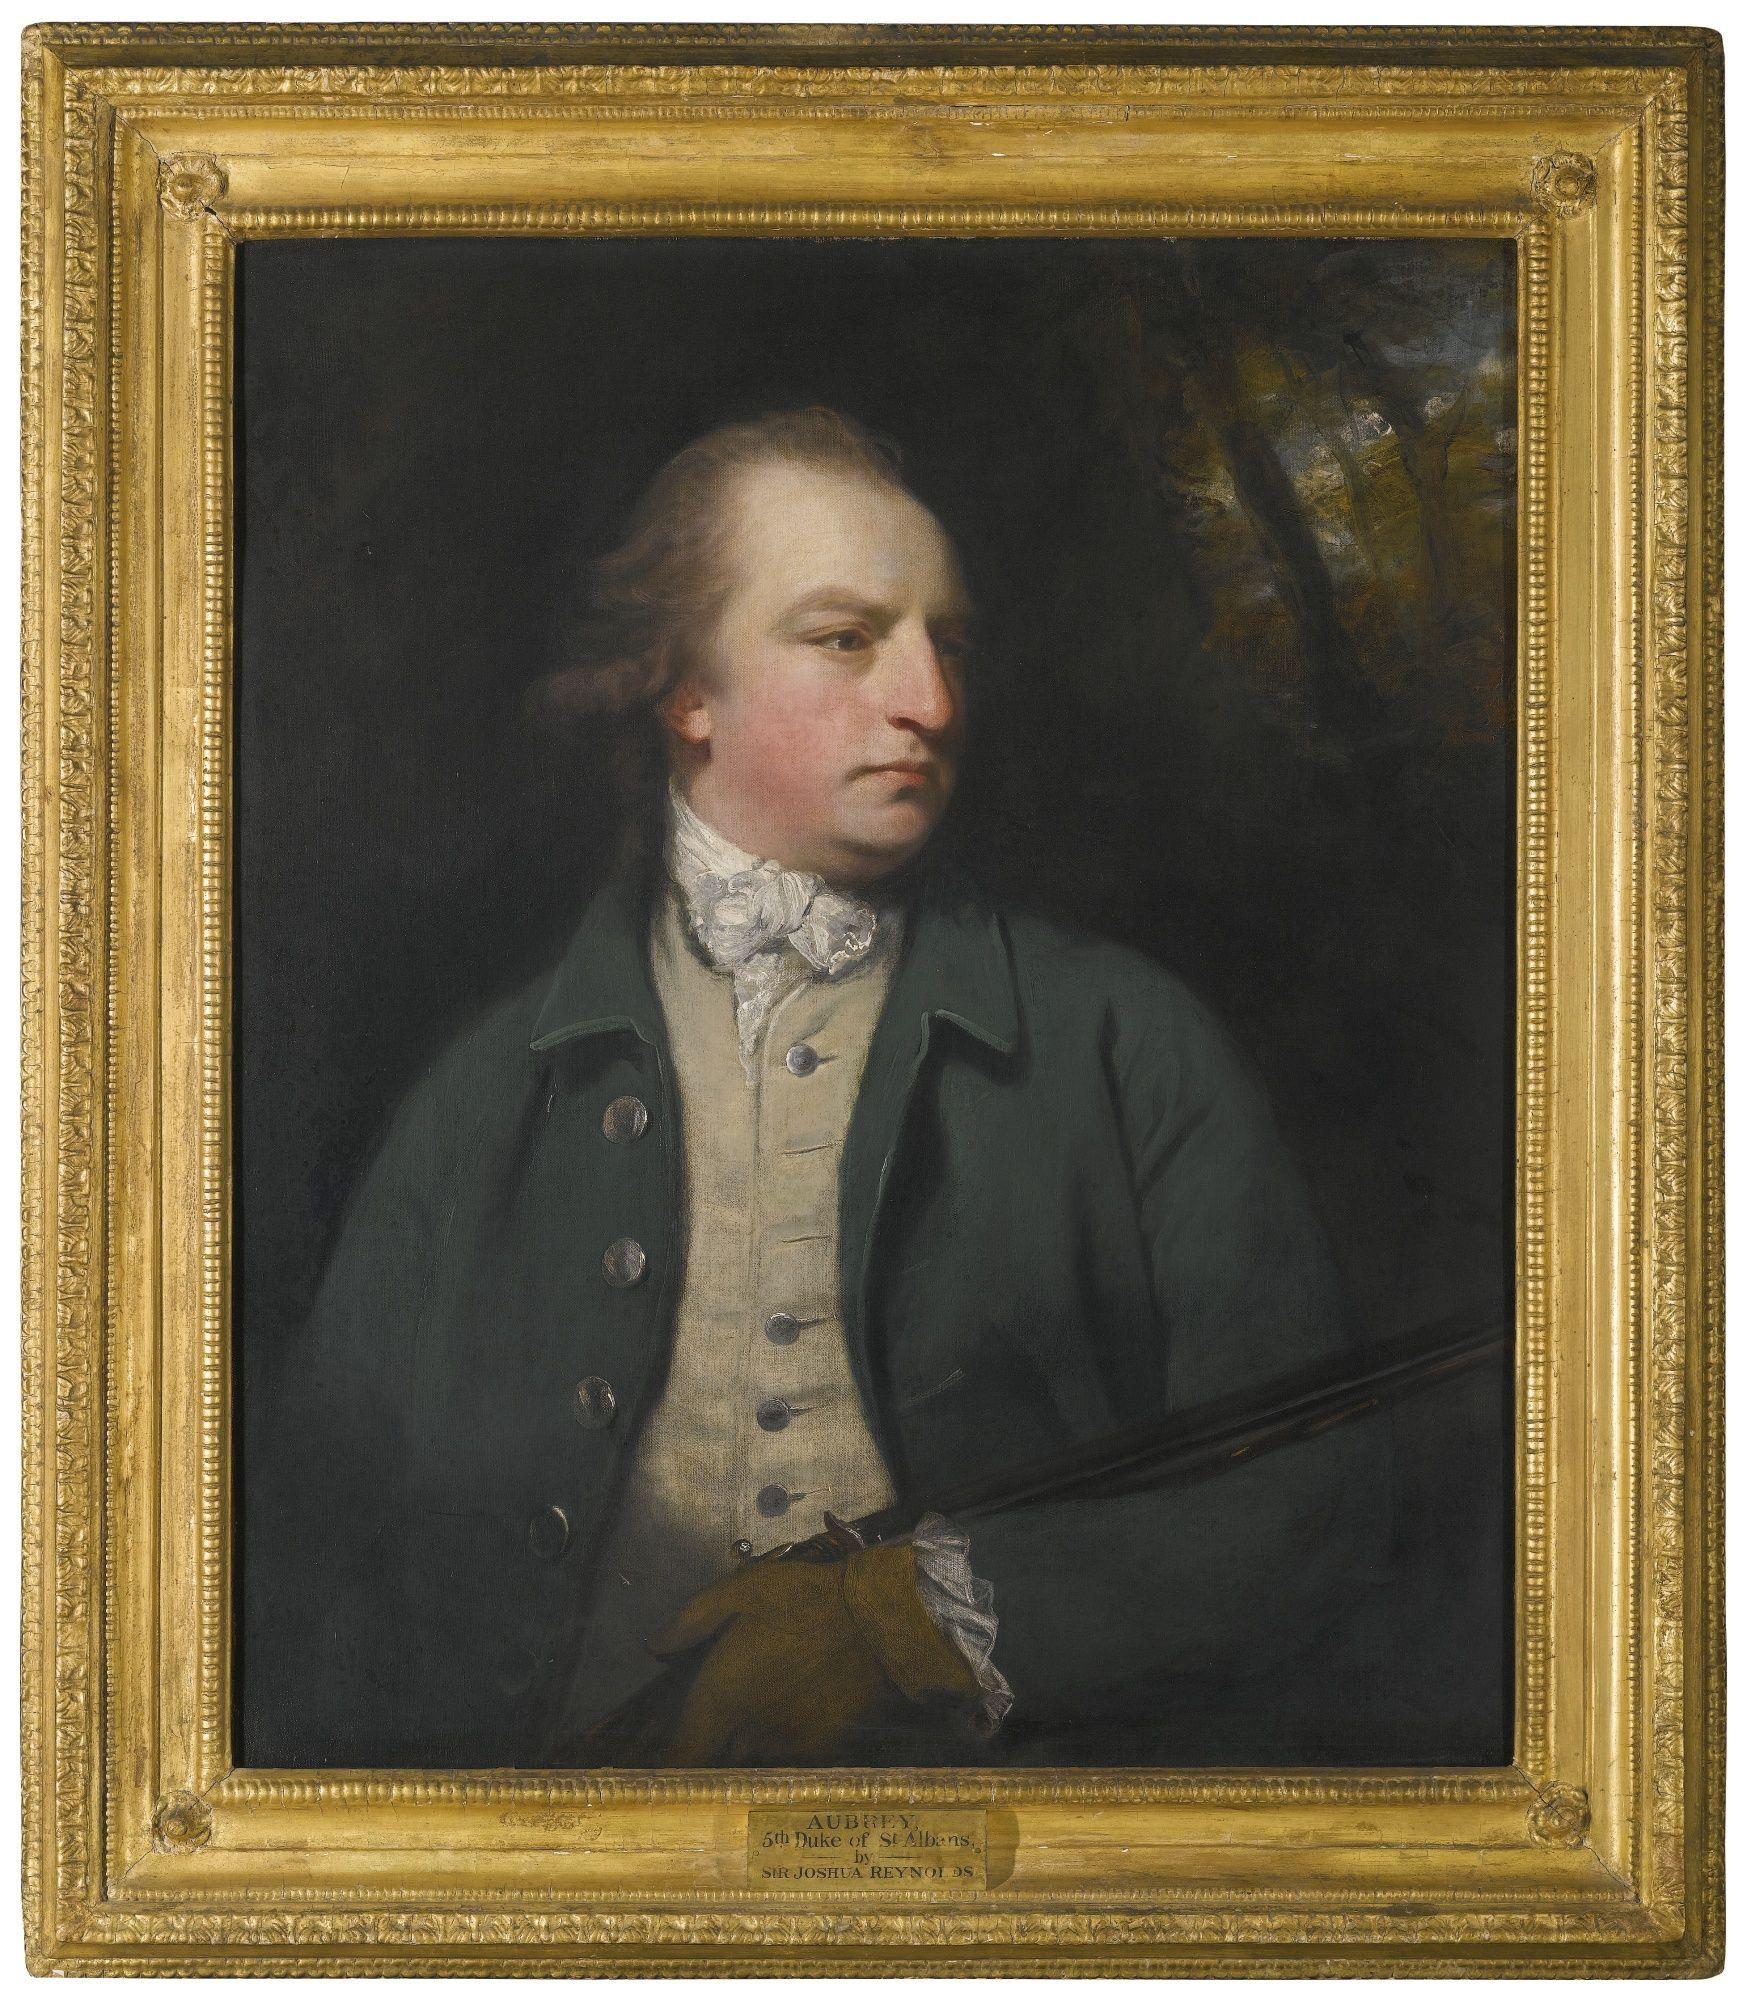 Sir Joshua Reynolds, P.R.A. PLYMPTON, DEVON 1723 - 1792 LONDON PORTRAIT OF AUBREY BEAUCLERK, 5TH DUKE OF ST. ALBANS (1740 - 1802), HALF LENGTH, WEARING A GREEN COAT AND HOLDING A FLINTLOCK oil on canvas.